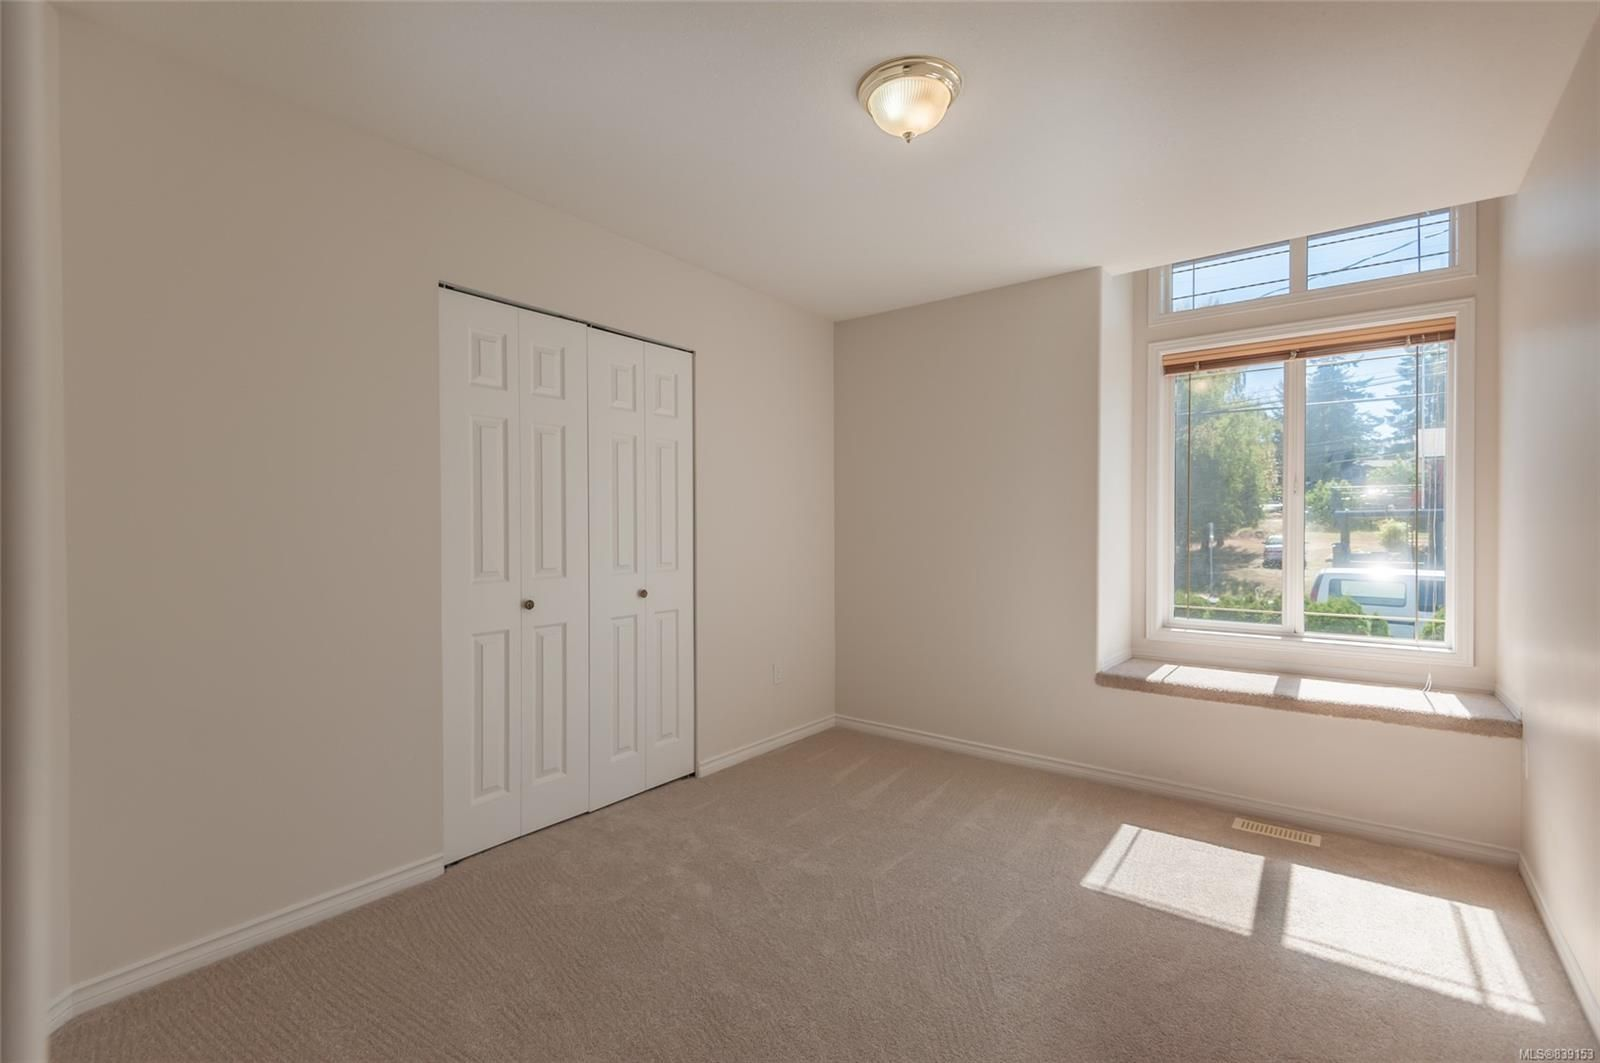 Photo 16: Photos: 6412 Dover Rd in NANAIMO: Na North Nanaimo House for sale (Nanaimo)  : MLS®# 839153